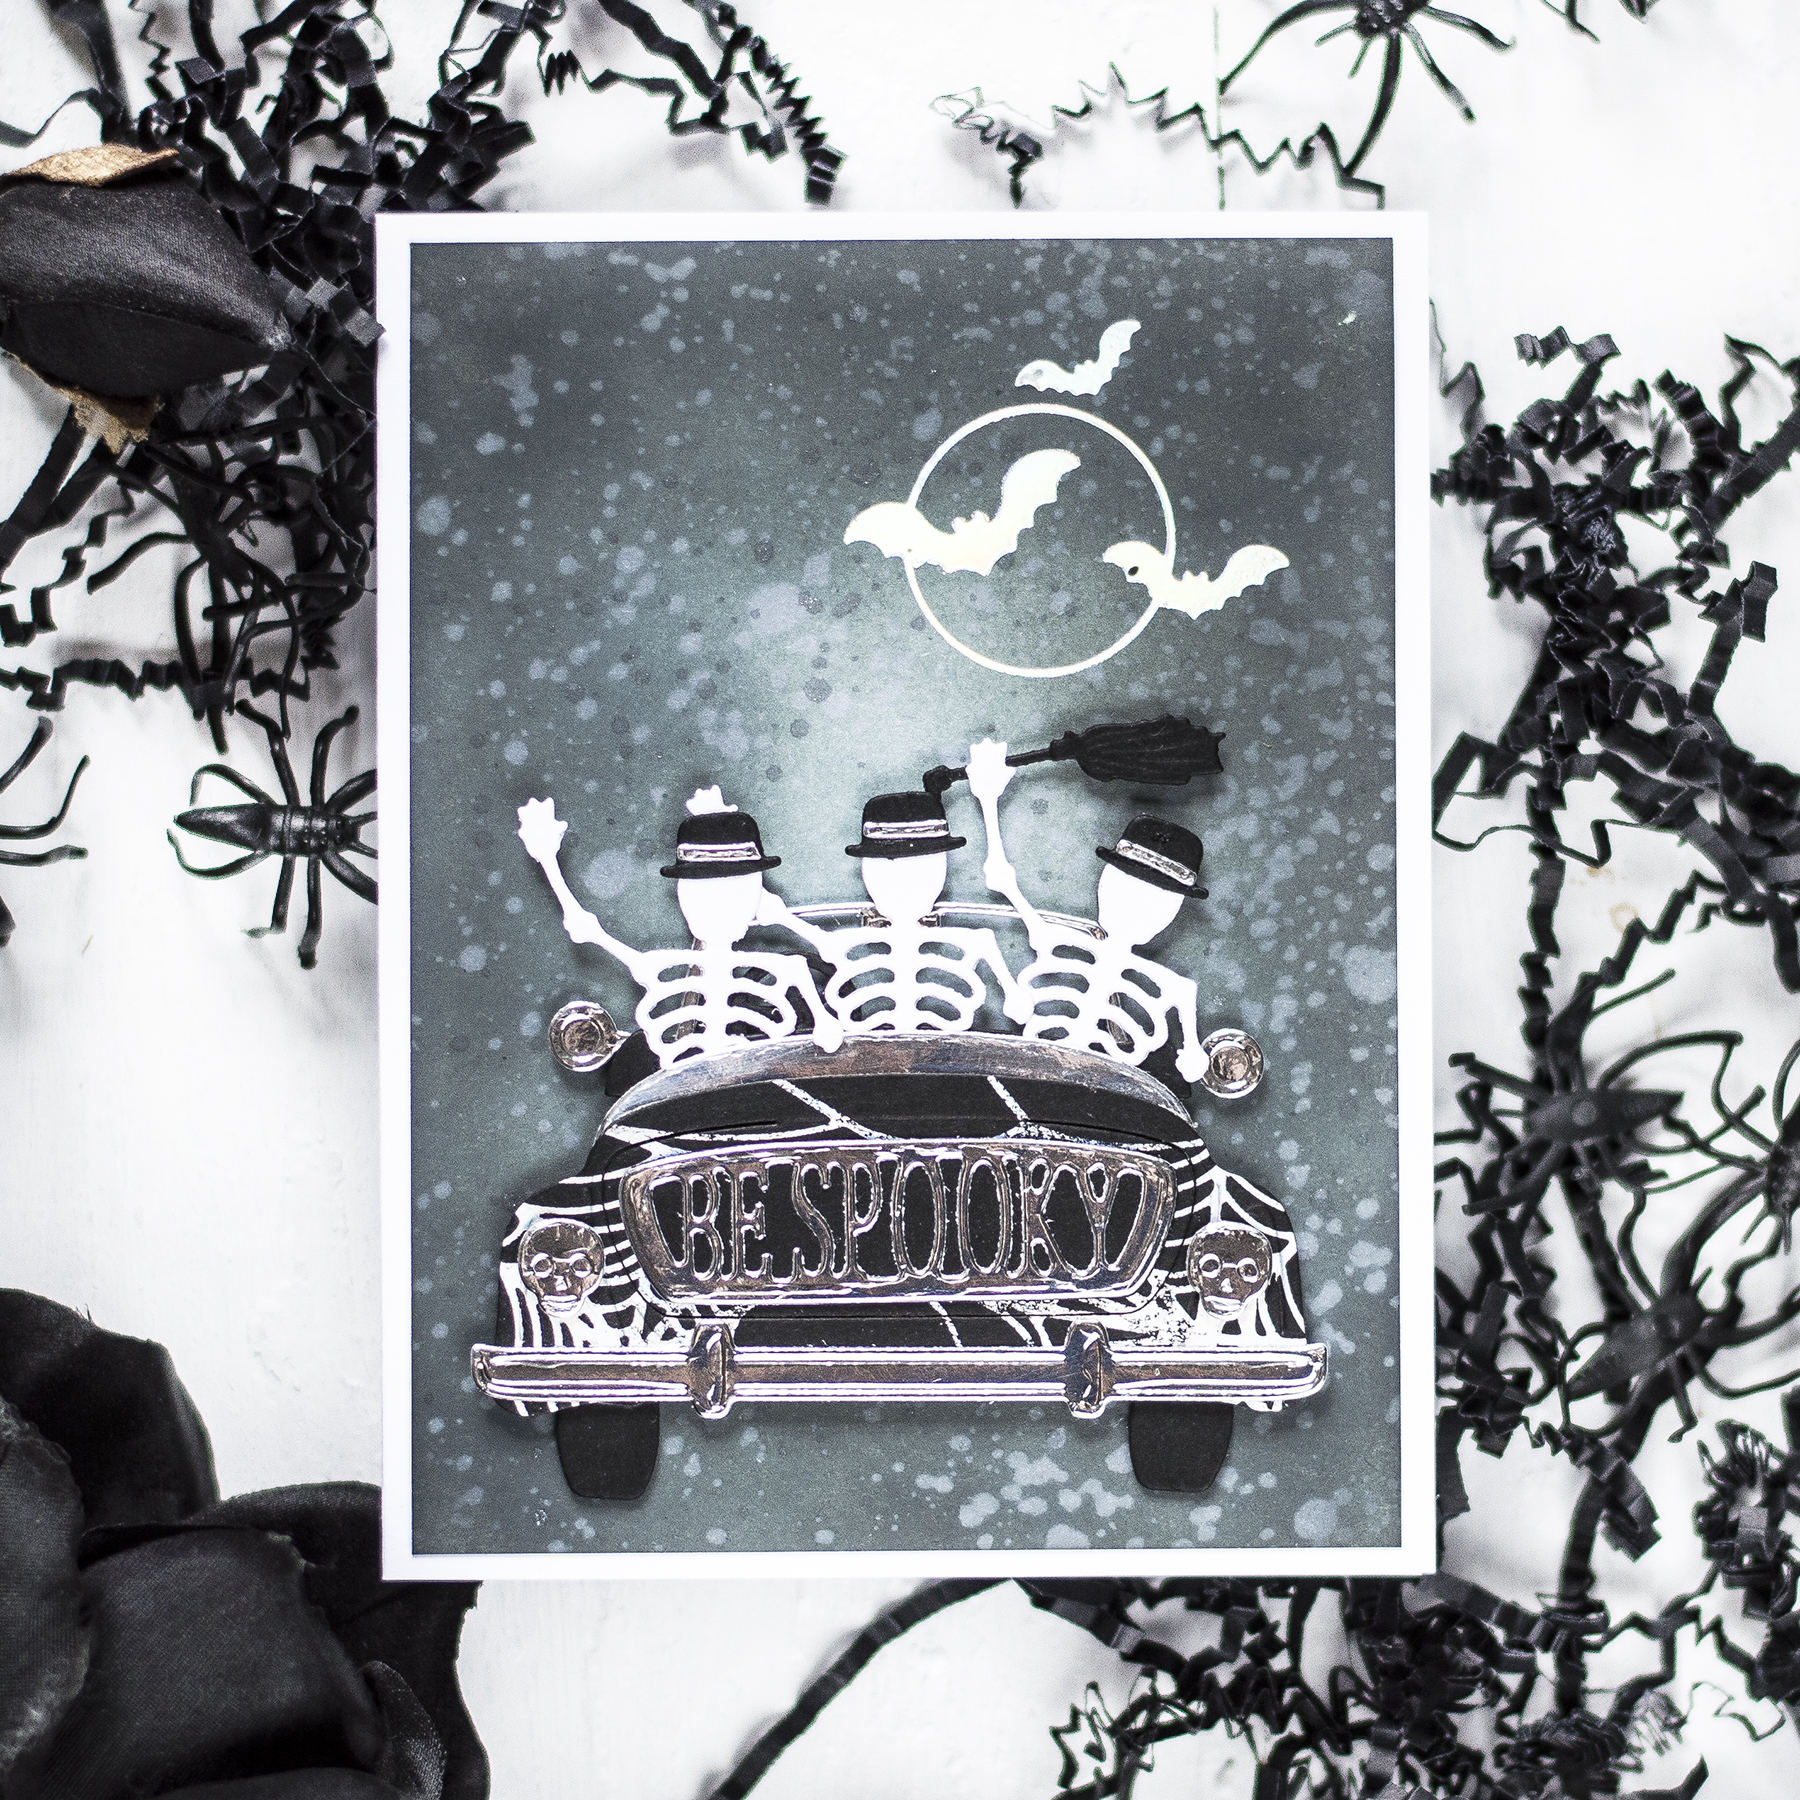 Spooky Drive Halloween Card. Card by Svitlana Shayevich